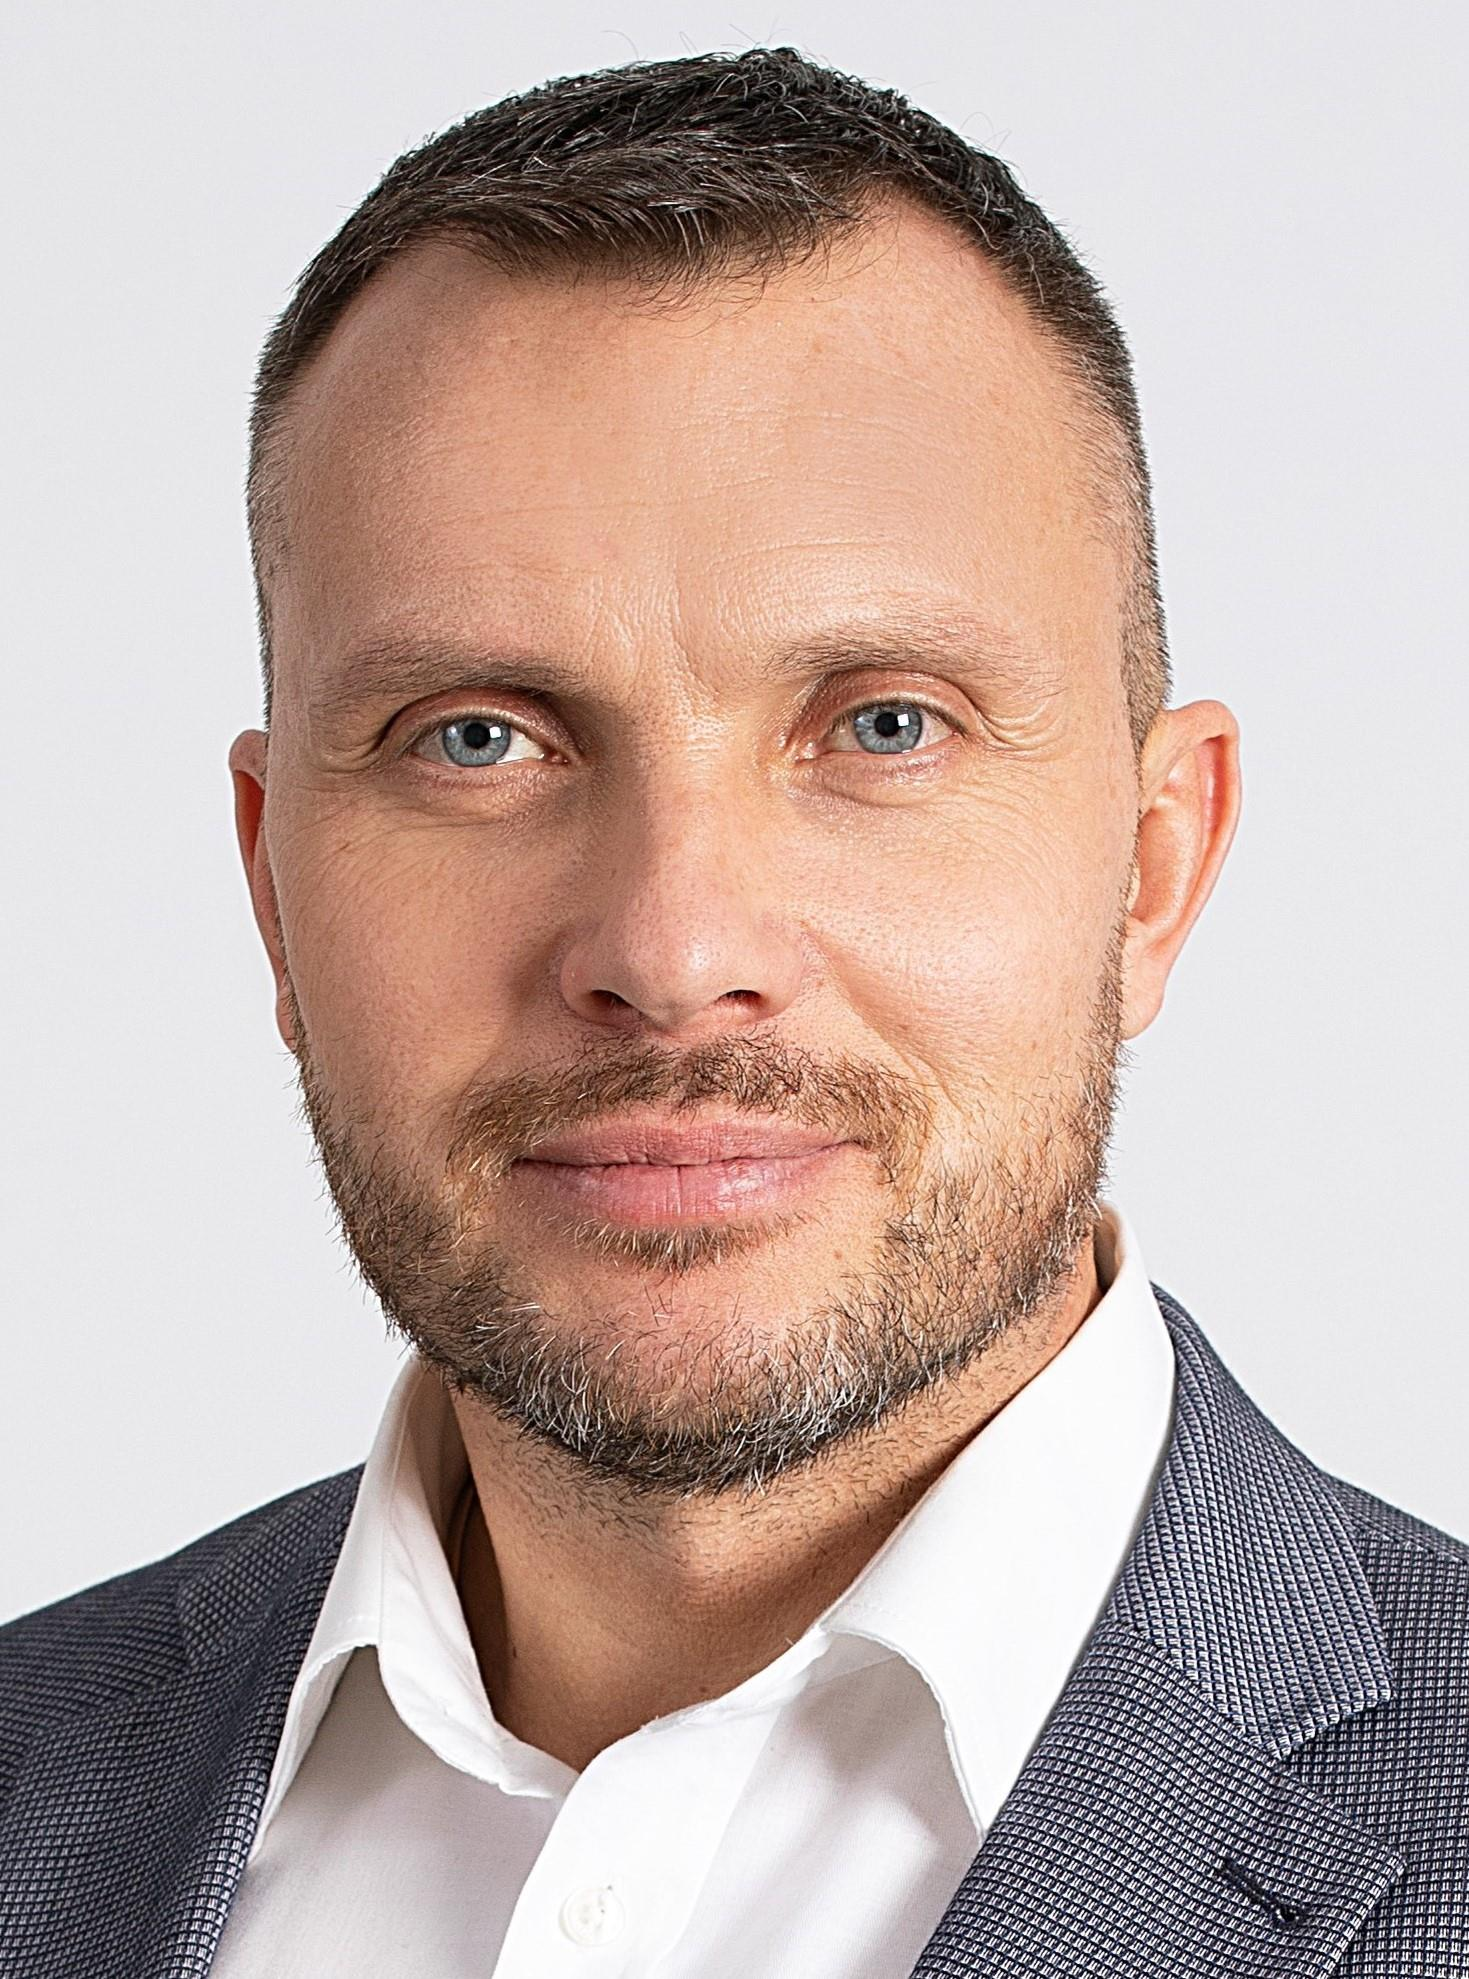 Suja, Miroslav